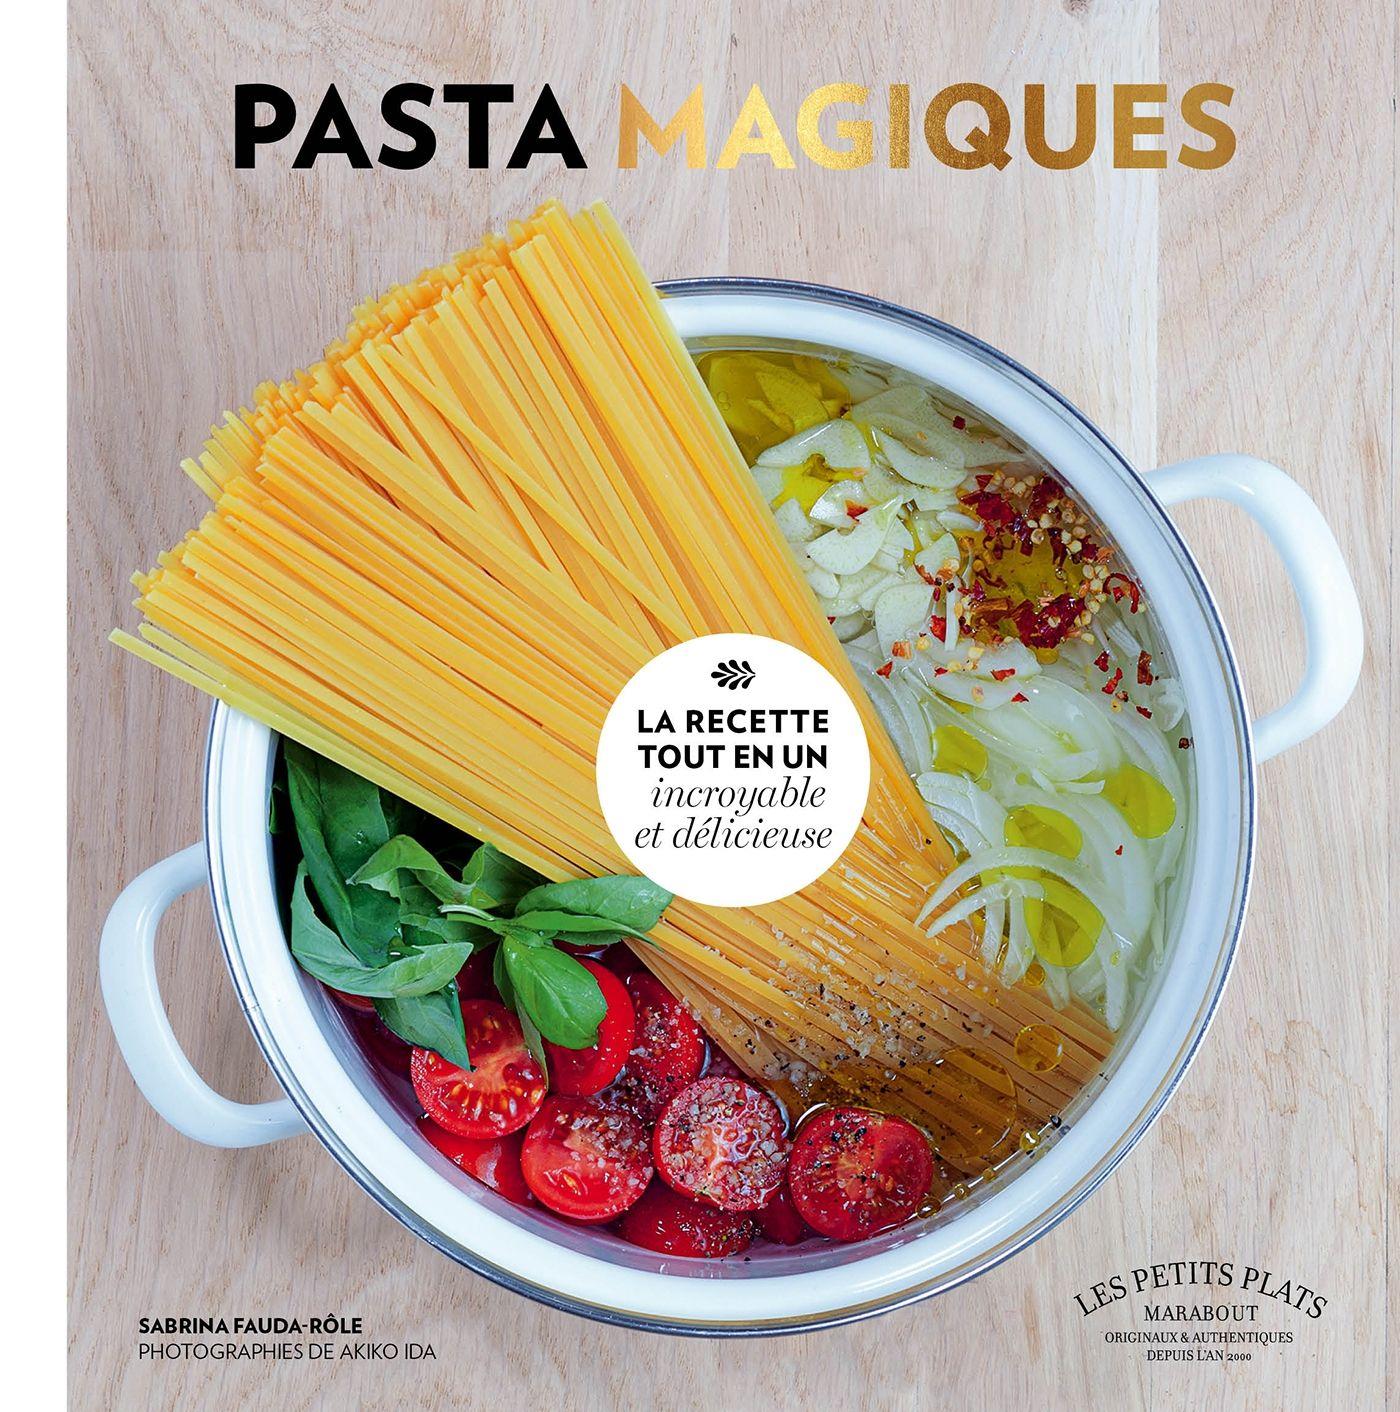 pasta magiques #pasta #cuisine #magique #marabout #cuisine